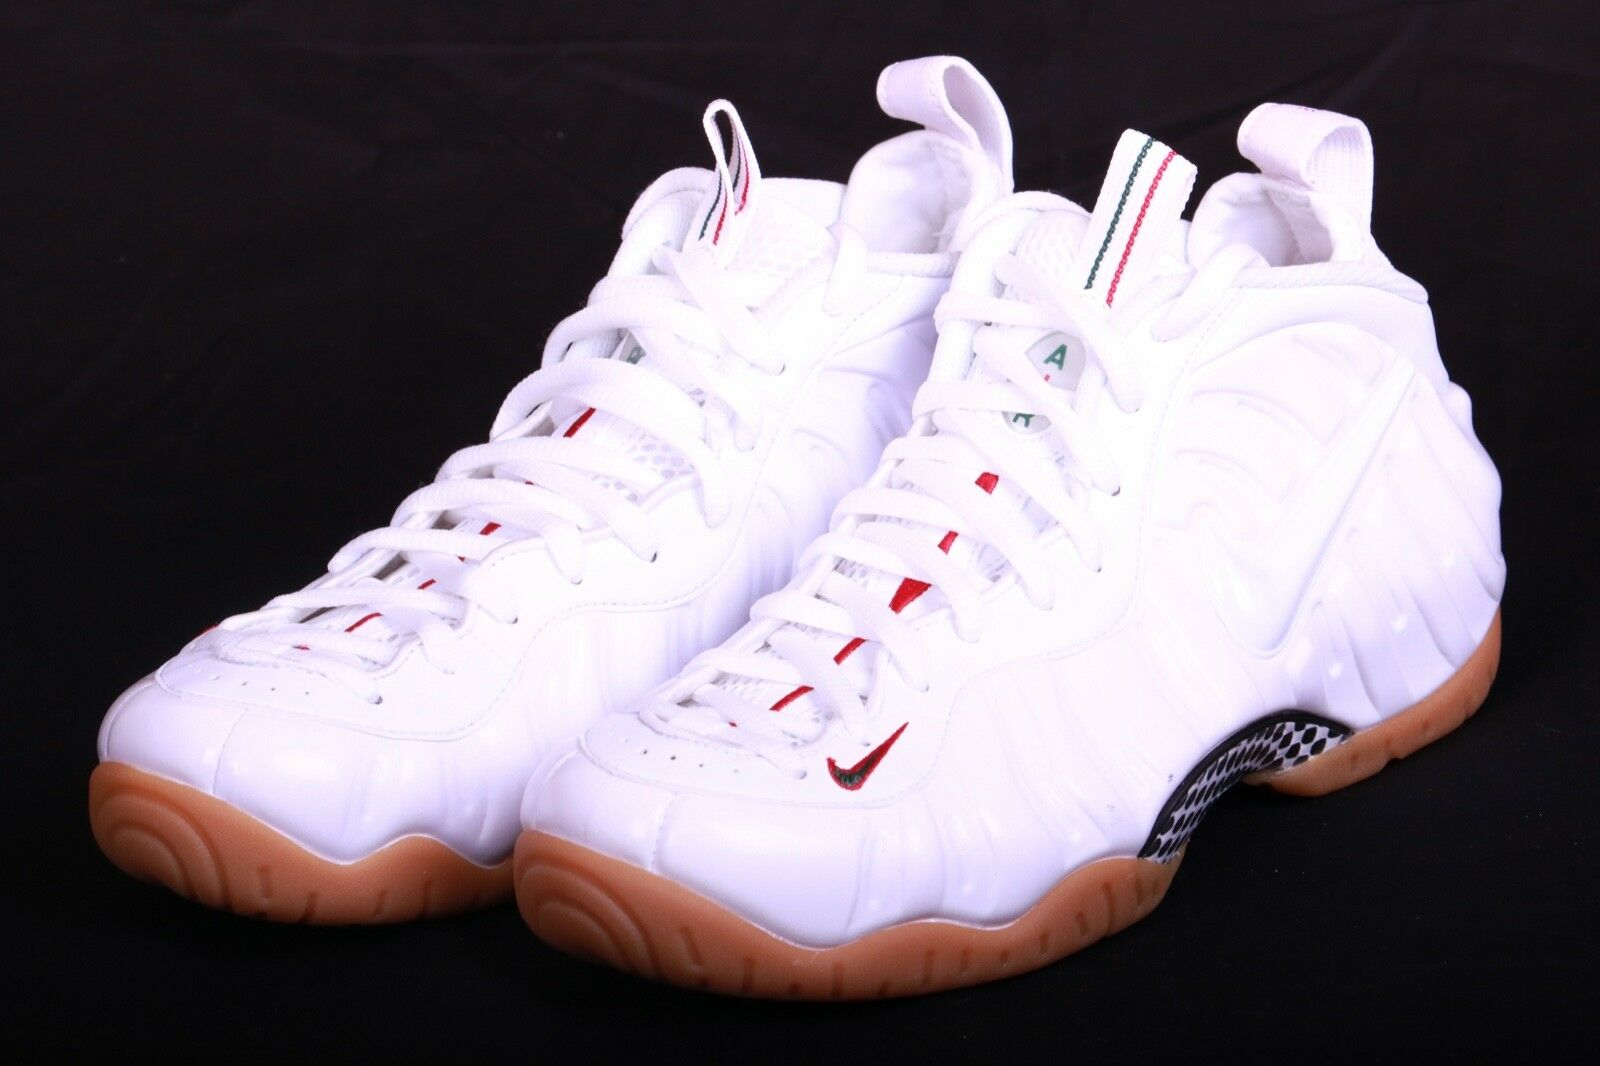 6d21bd0793c8c Nike Air Foamposite Pro Size 9.5 Mens Winter White Foams 624041 102 ...